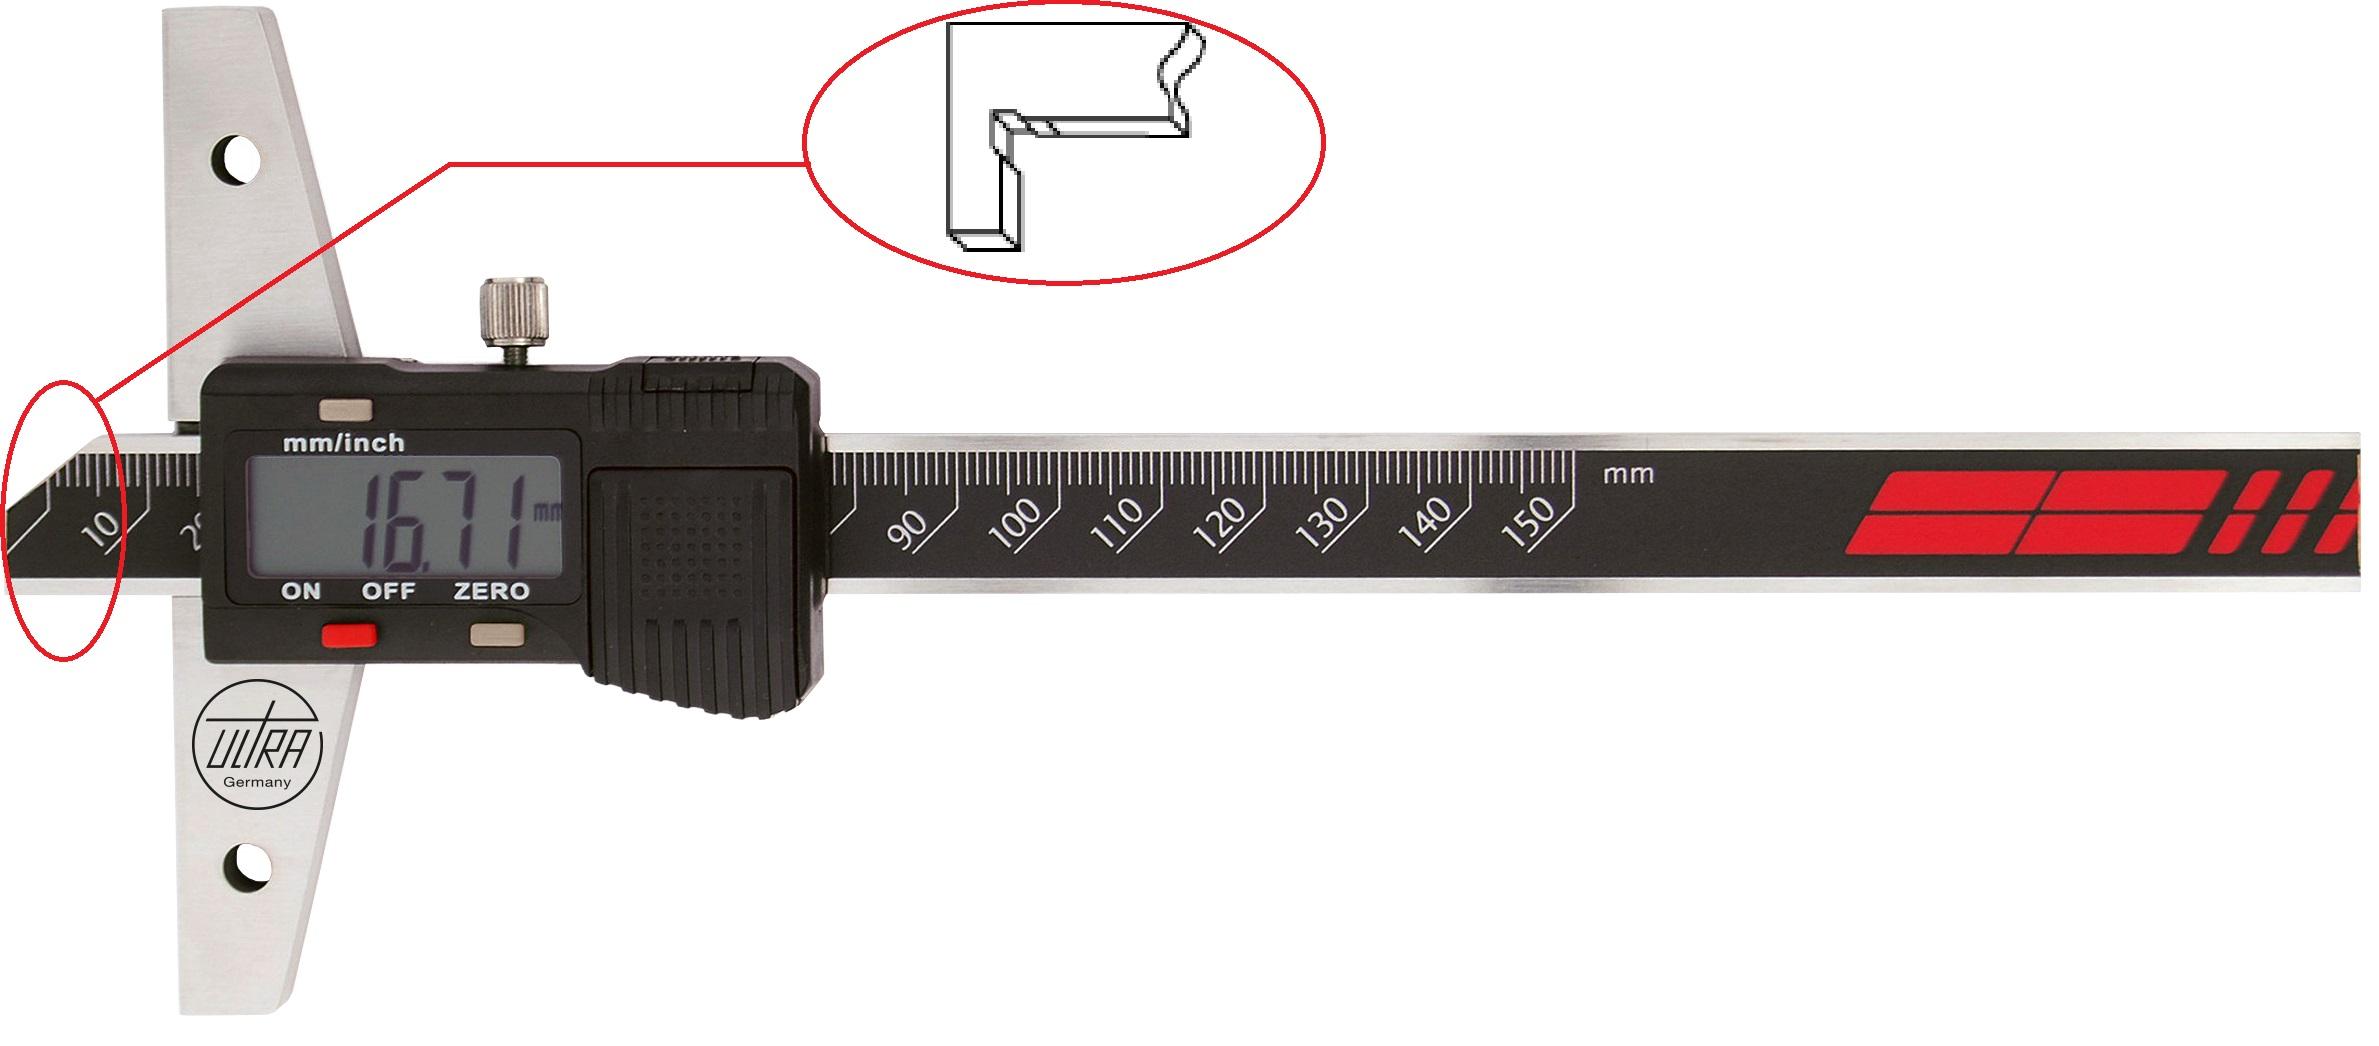 "Digital depth gauge Ultra Prazision, 0-300mm/0-12"", resolutin: 0,01mm, with the hook"